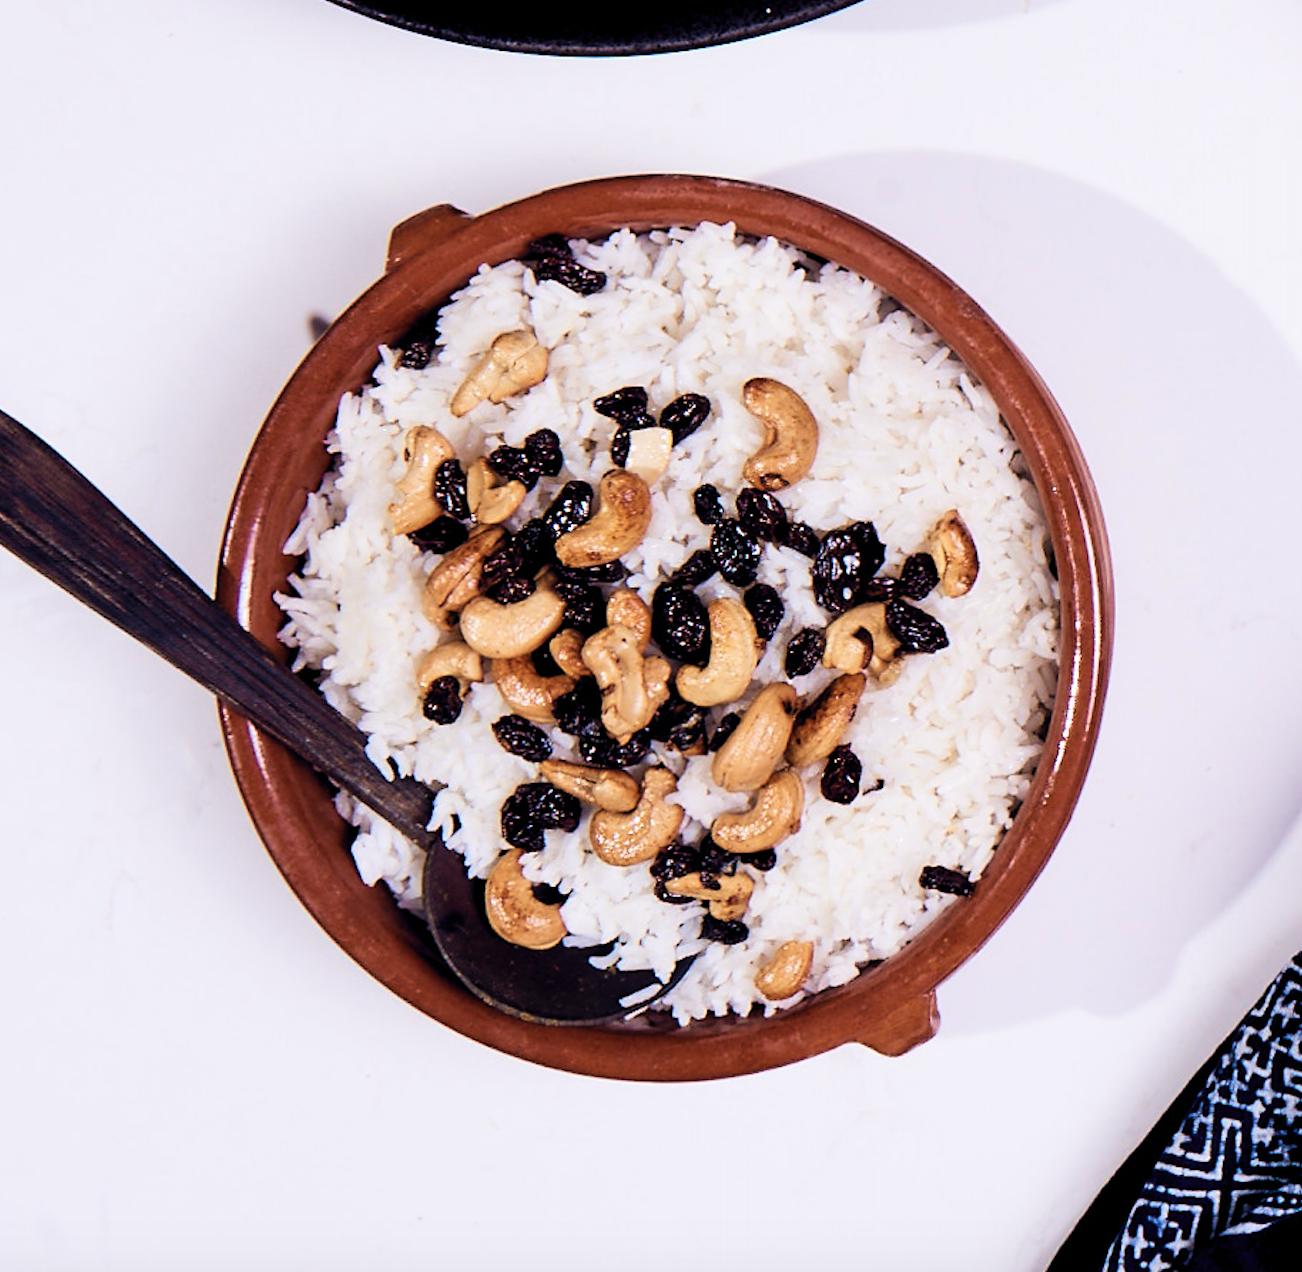 basmati-rice-with-raisins-cashews